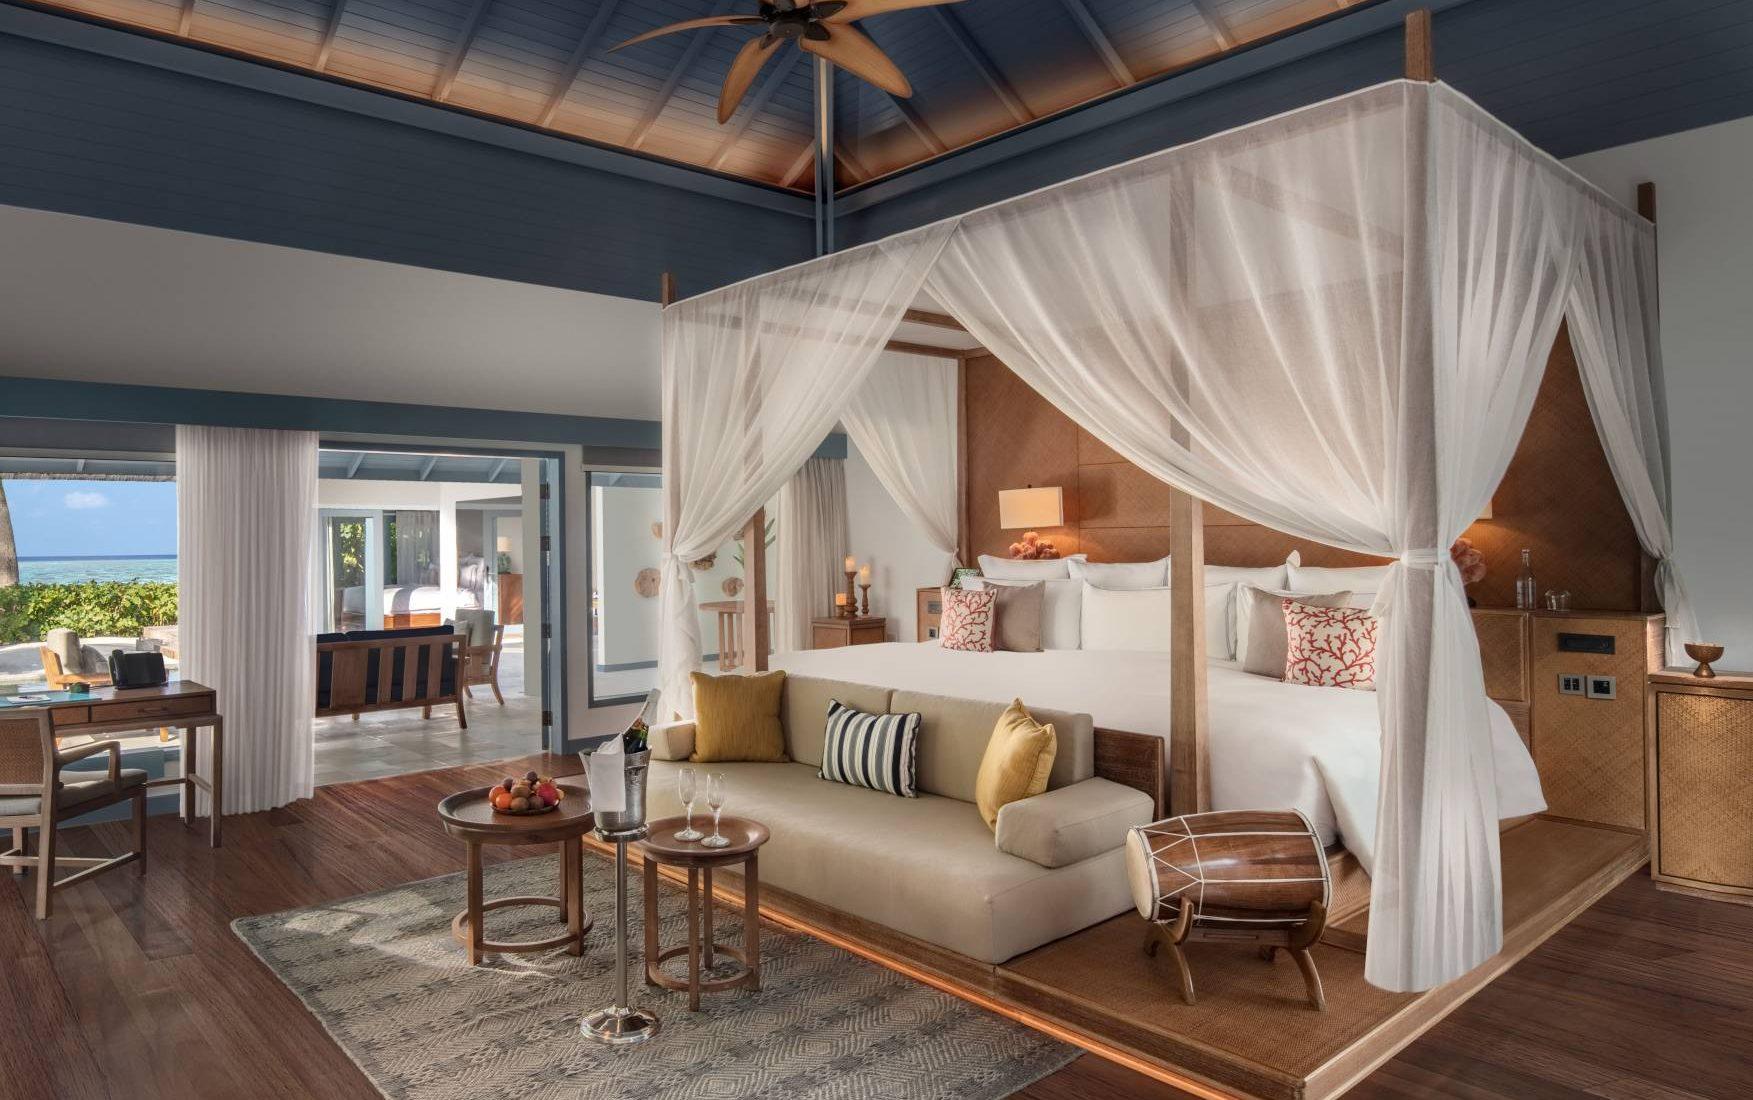 Raffles Maldives Meradhoo - Deluxe Beach Villa with Pool